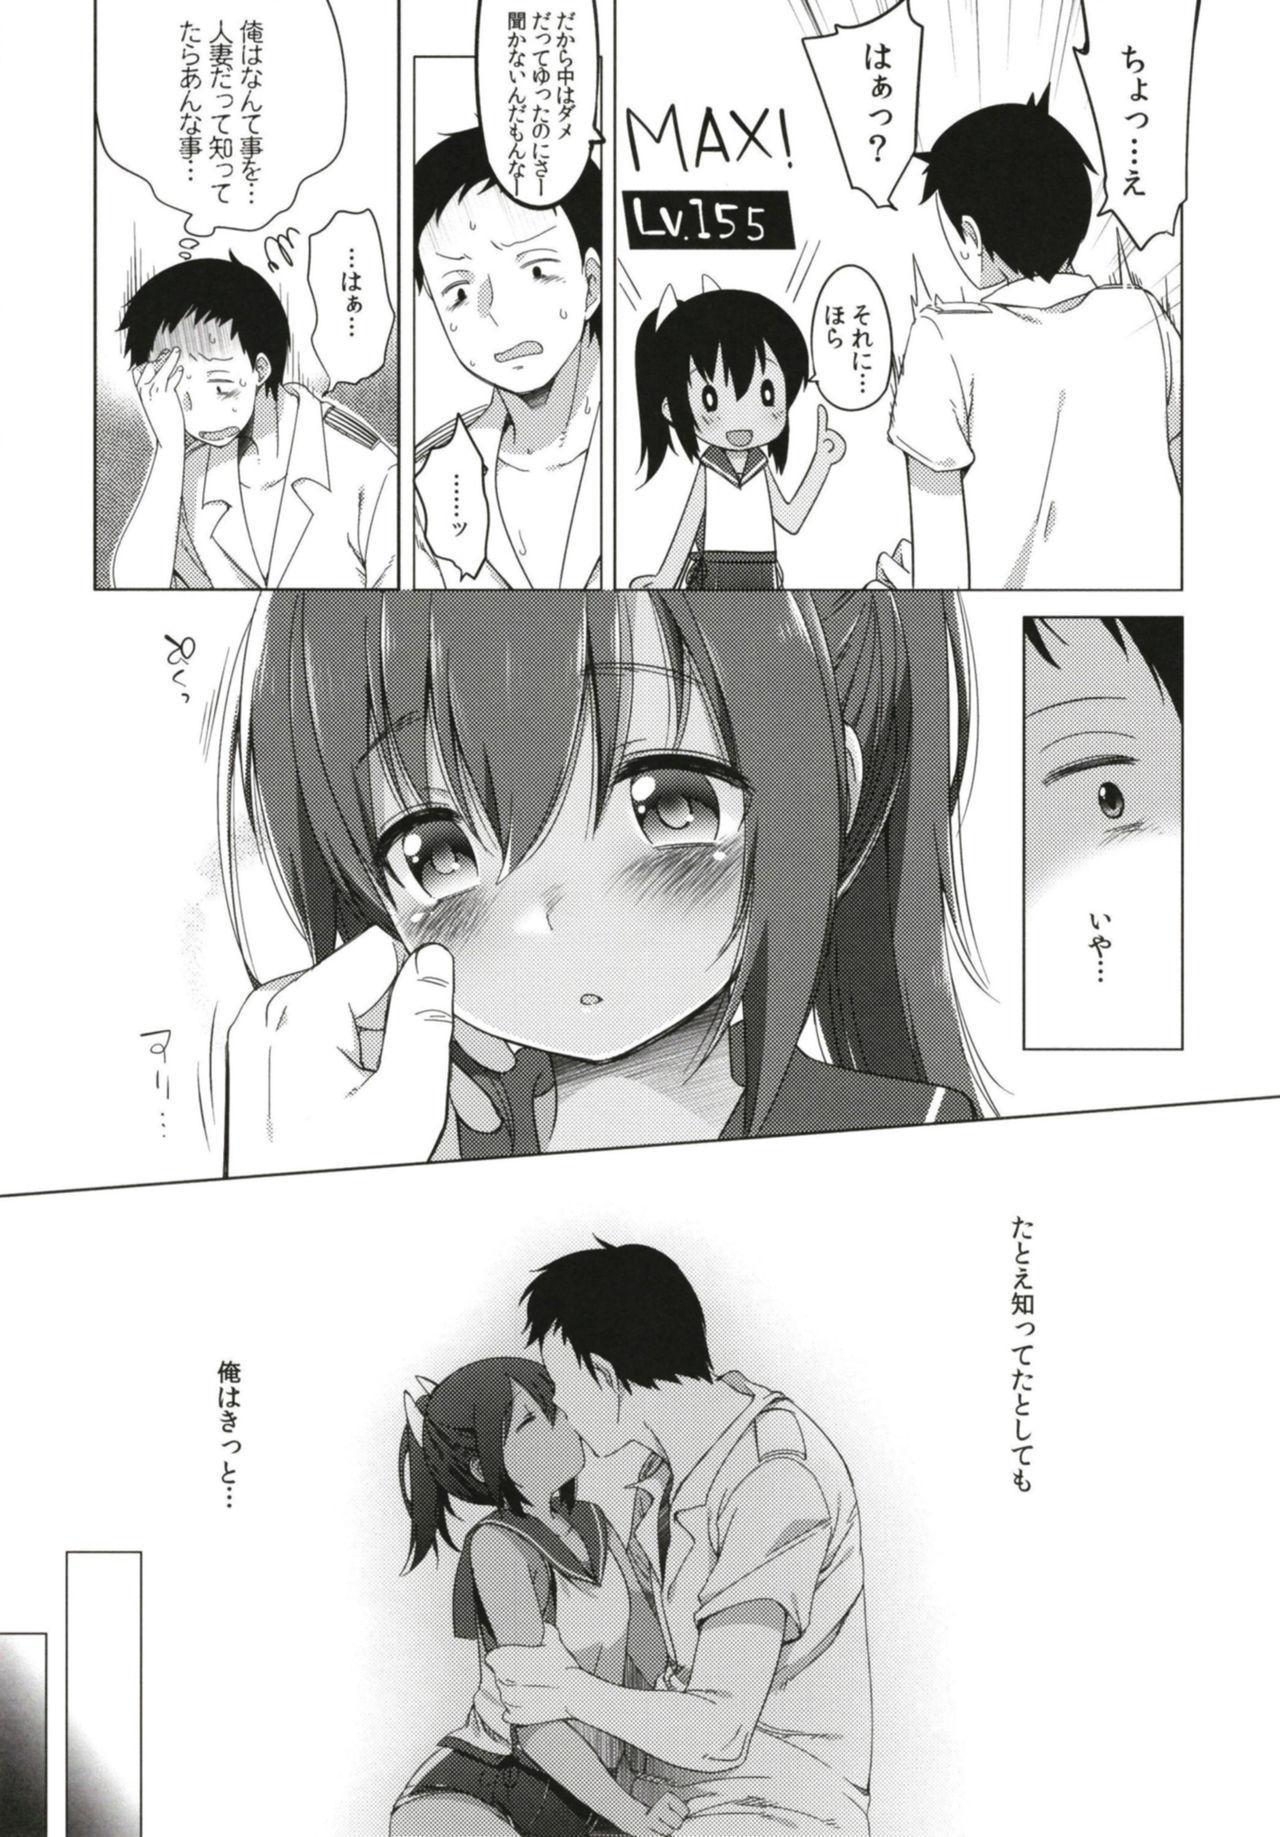 [French letter (Fujisaki Hikari)] Hitonatsu no Ayamachi -I-401 Soushuuhen- (Kantai Collection -KanColle-) [Digital] 22